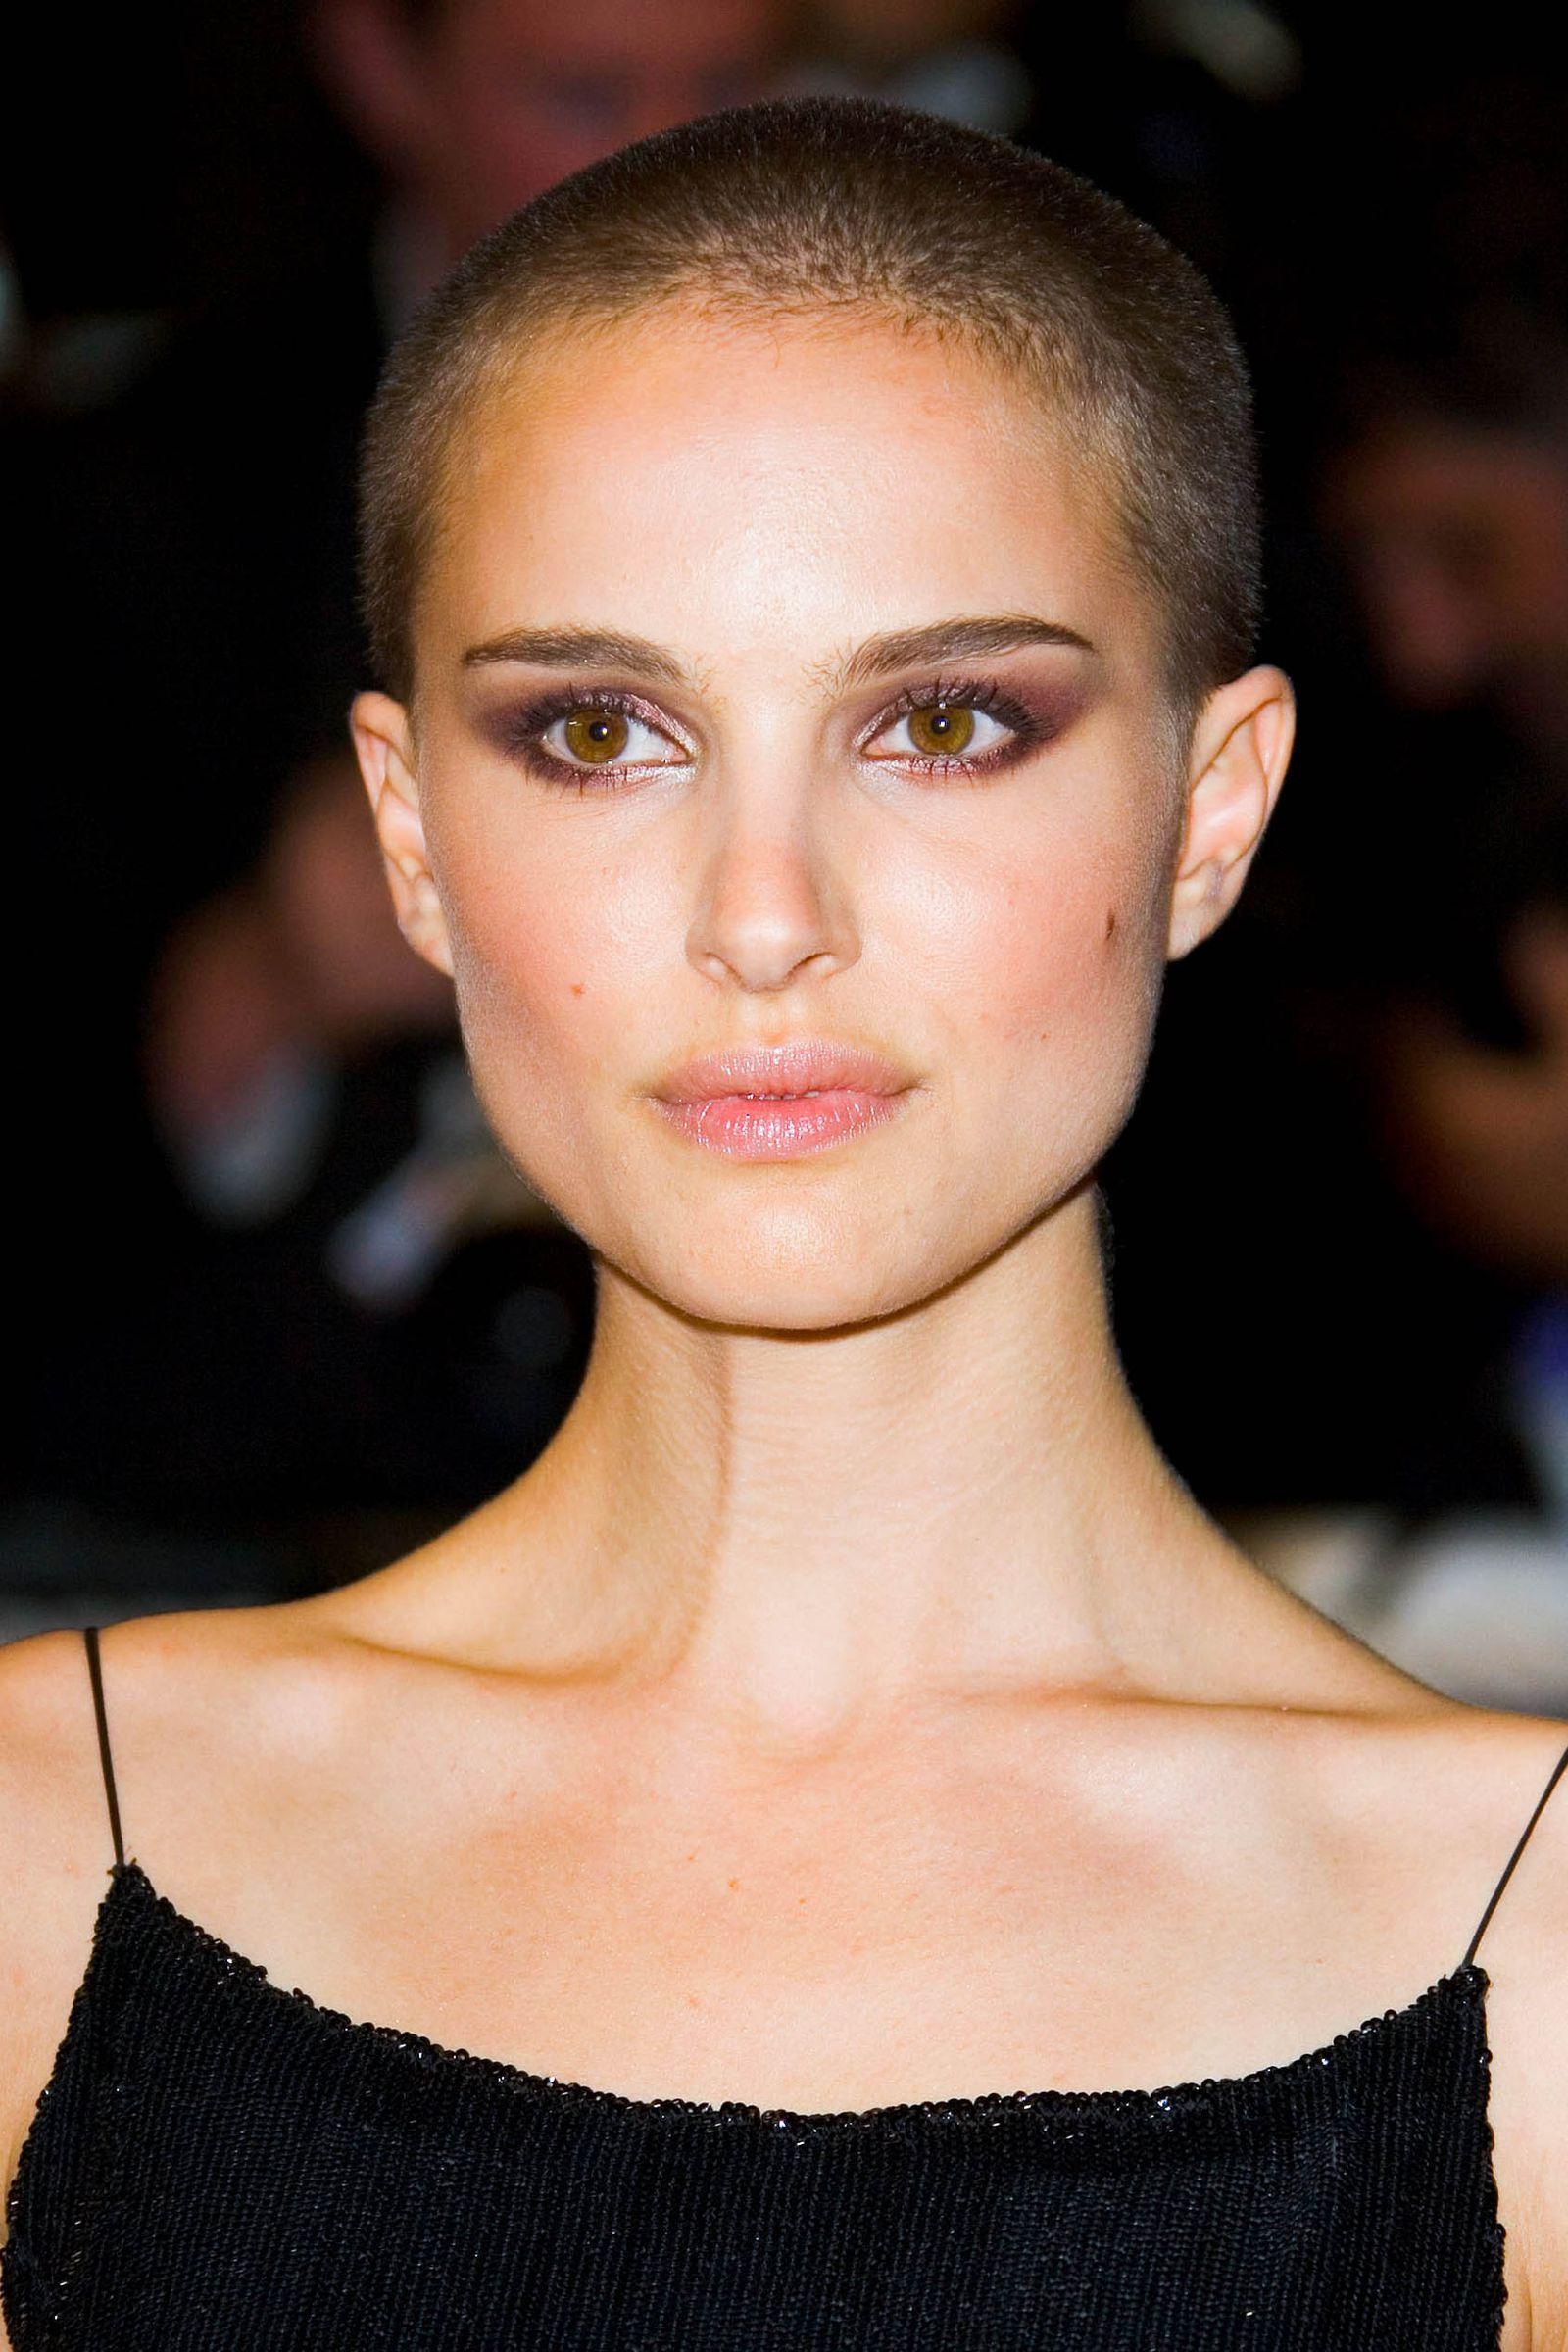 Consider, natile portmans shaved head indefinitely not